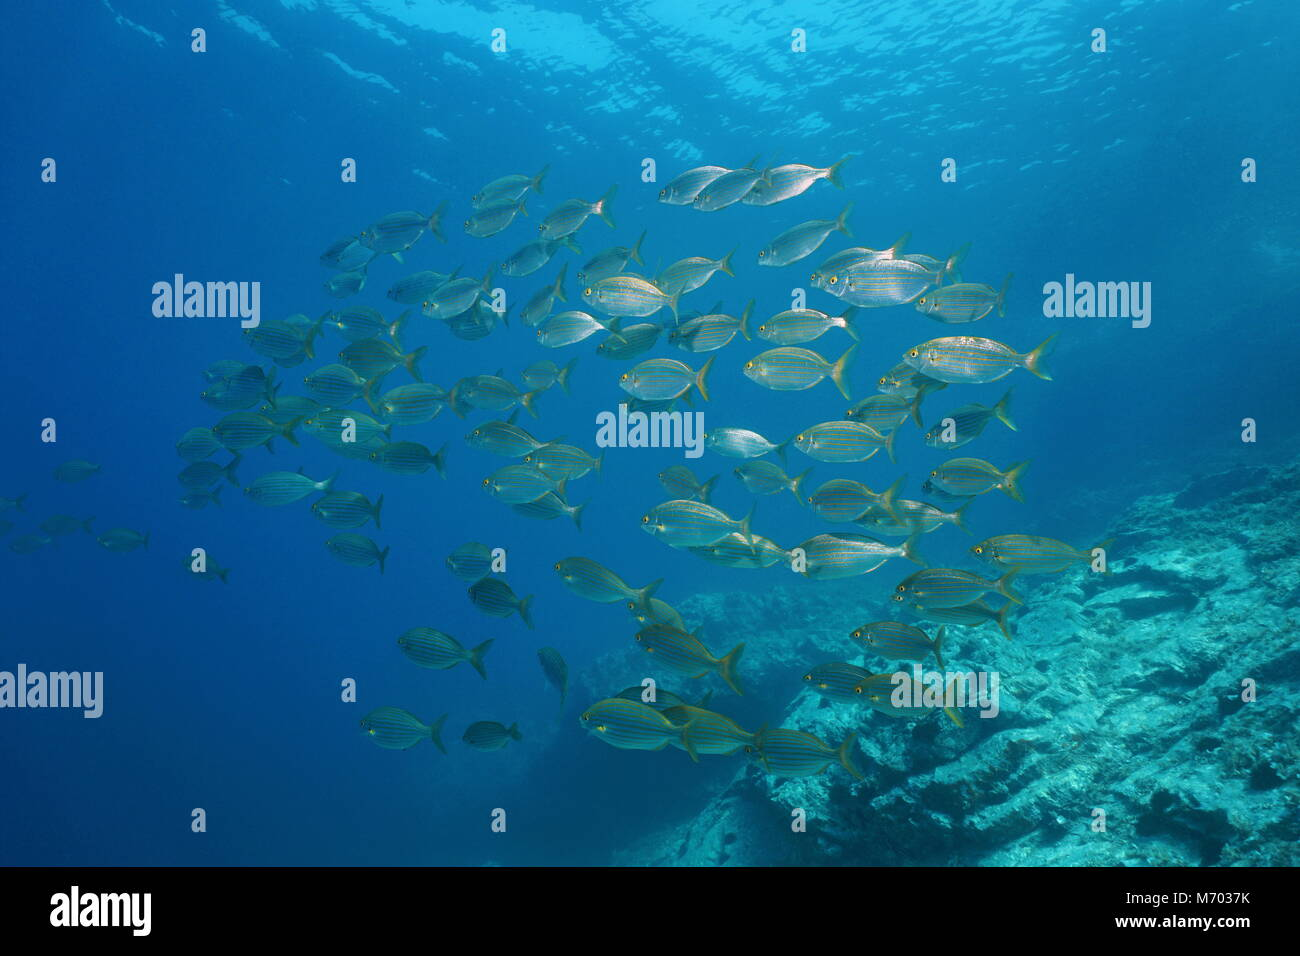 School of fish sea bream salema porgy underwater in the Mediterranean sea, Vermilion coast, Pyrenees-Orientales, Stock Photo